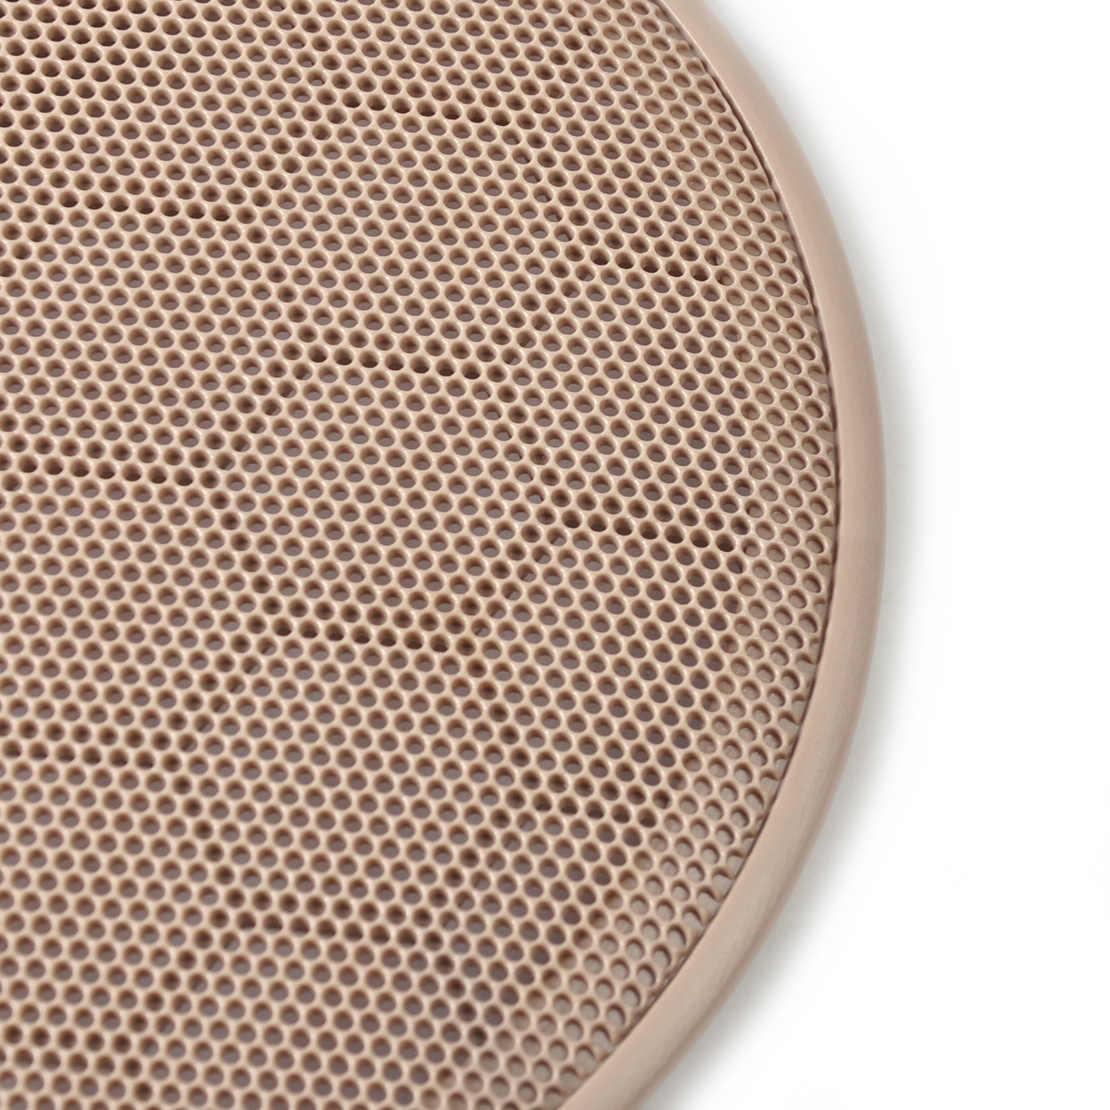 hight resolution of  dwcx 2pcs door loud speaker cover grill 3b0868149 for volkswagen passat b5 jetta mk4 golf gti